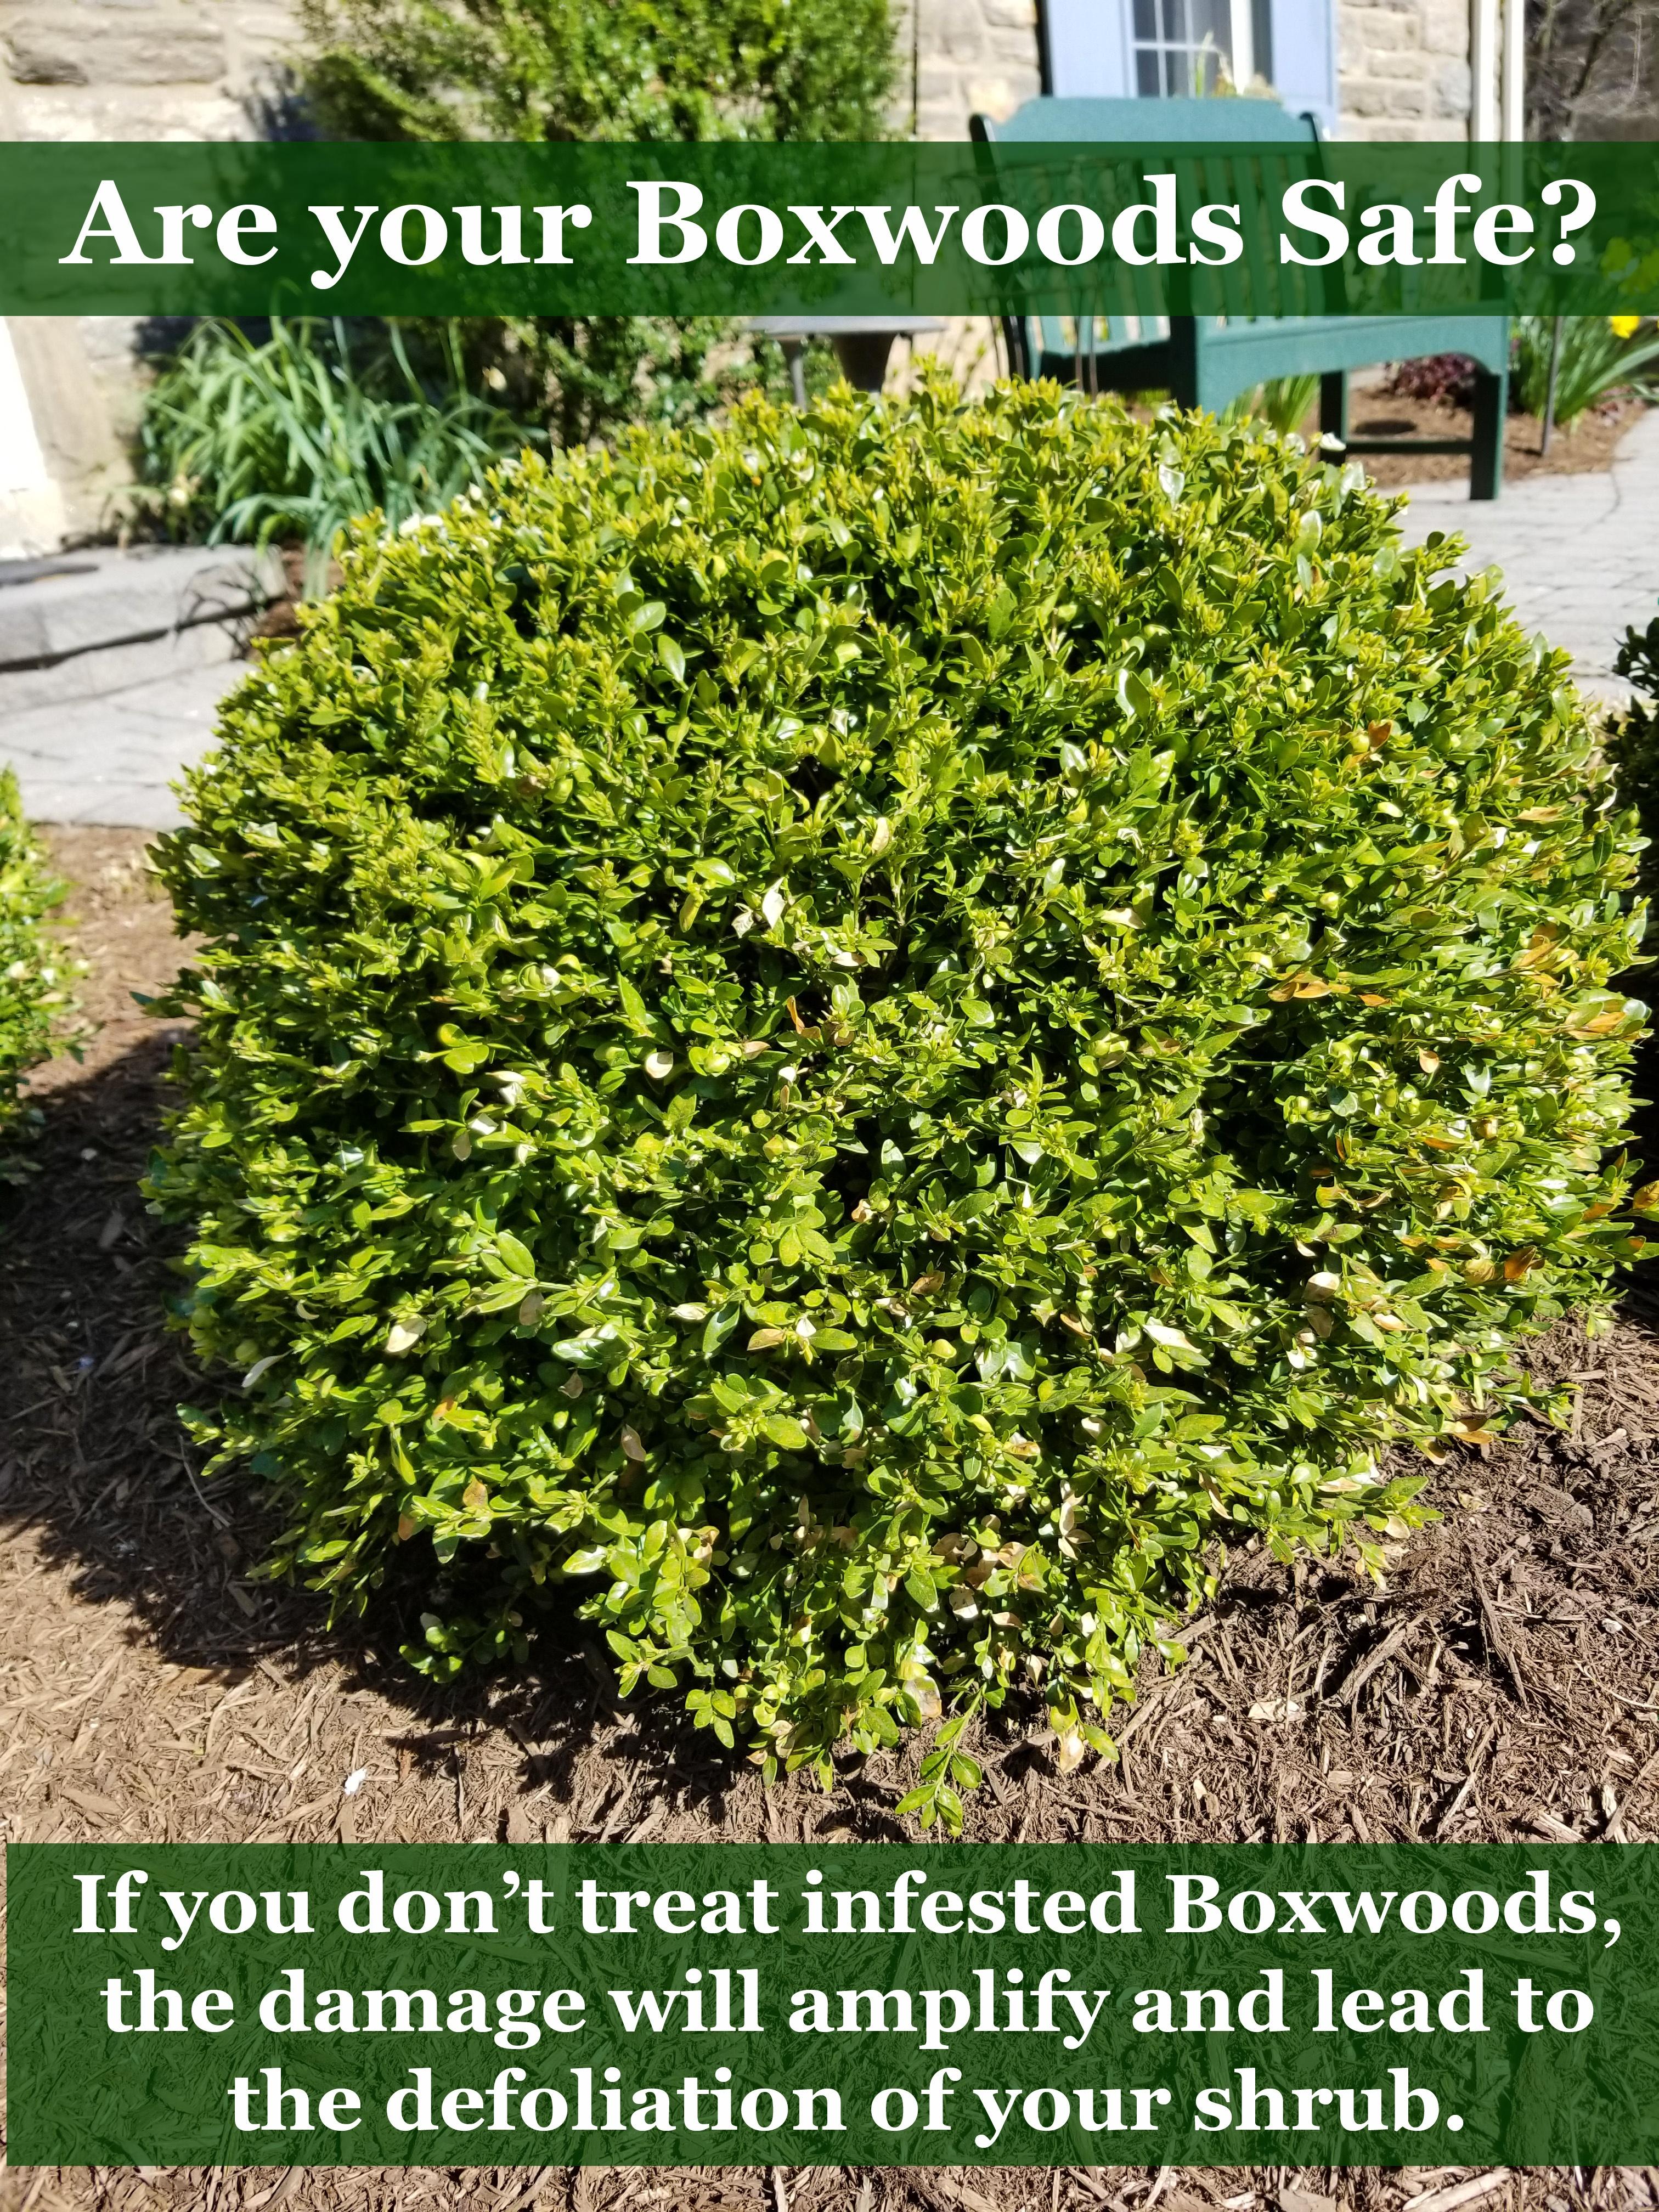 2018-Boxwood-Leaf-Miner-Damage-full-shrub-defoliation